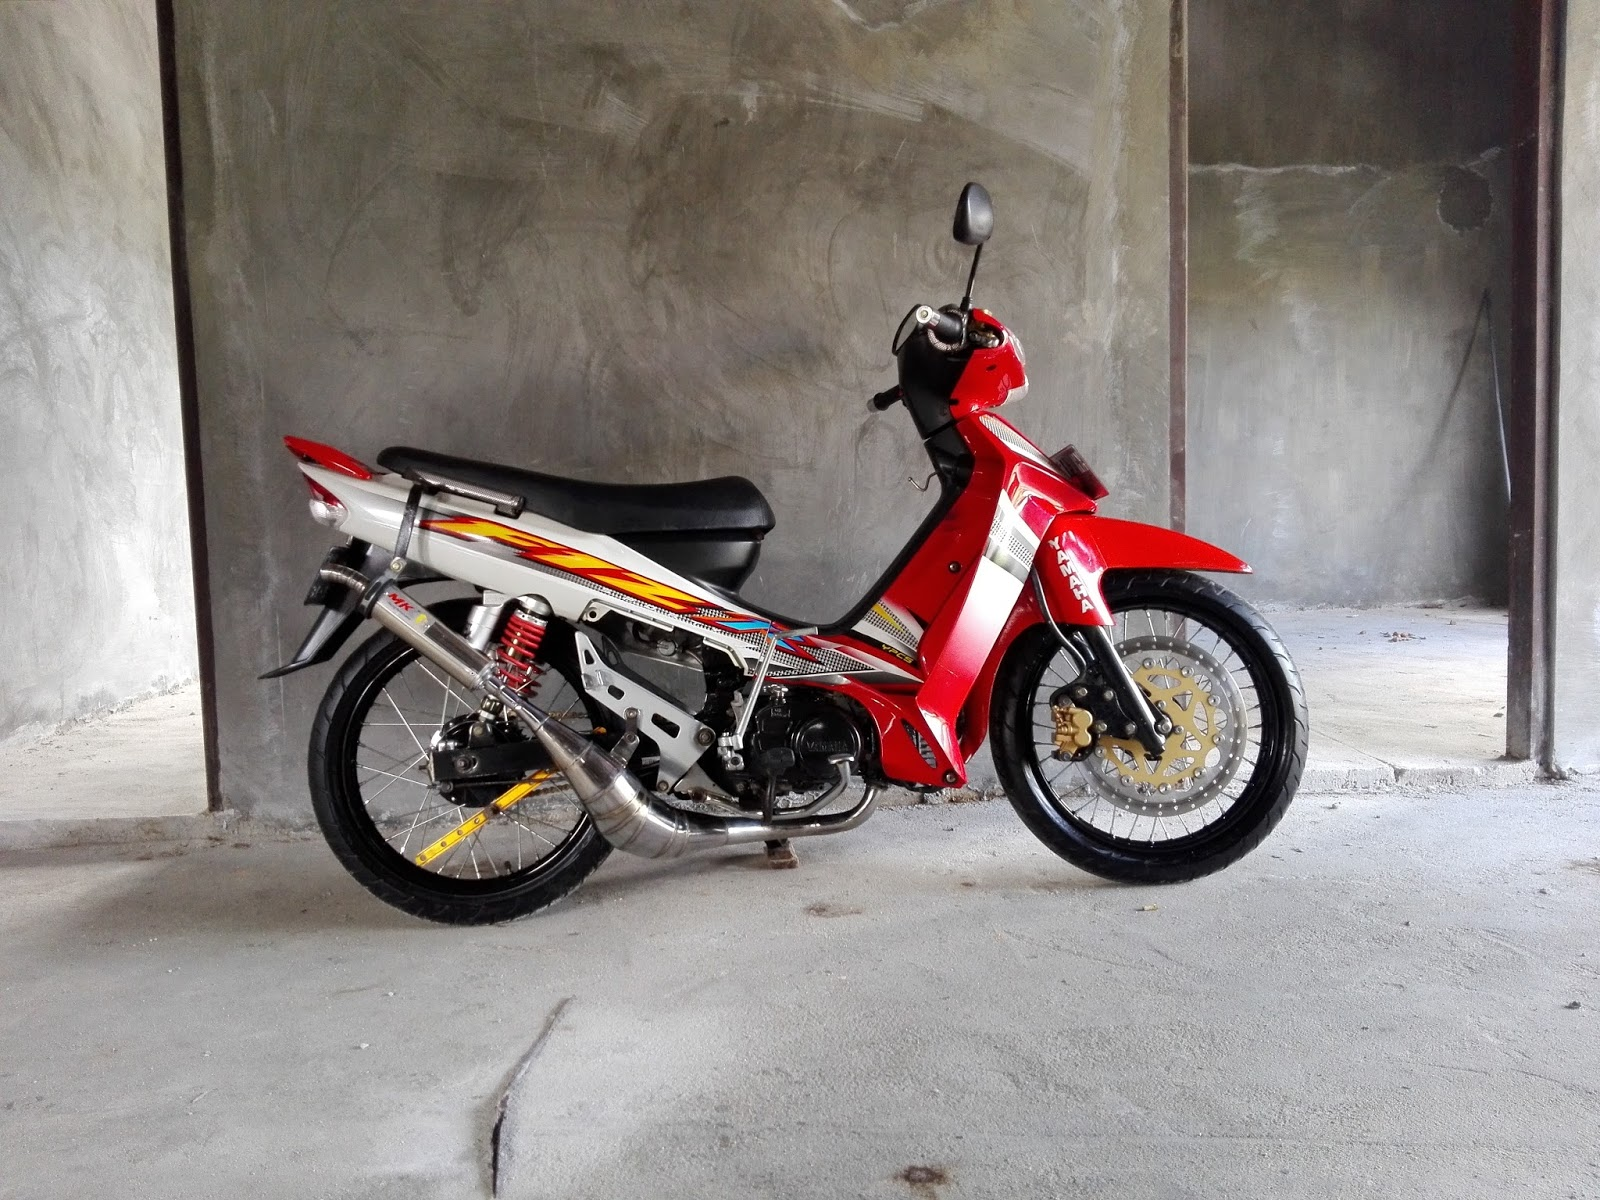 63 Modifikasi Motor Yamaha F1zr Terbaik Pinus Motor